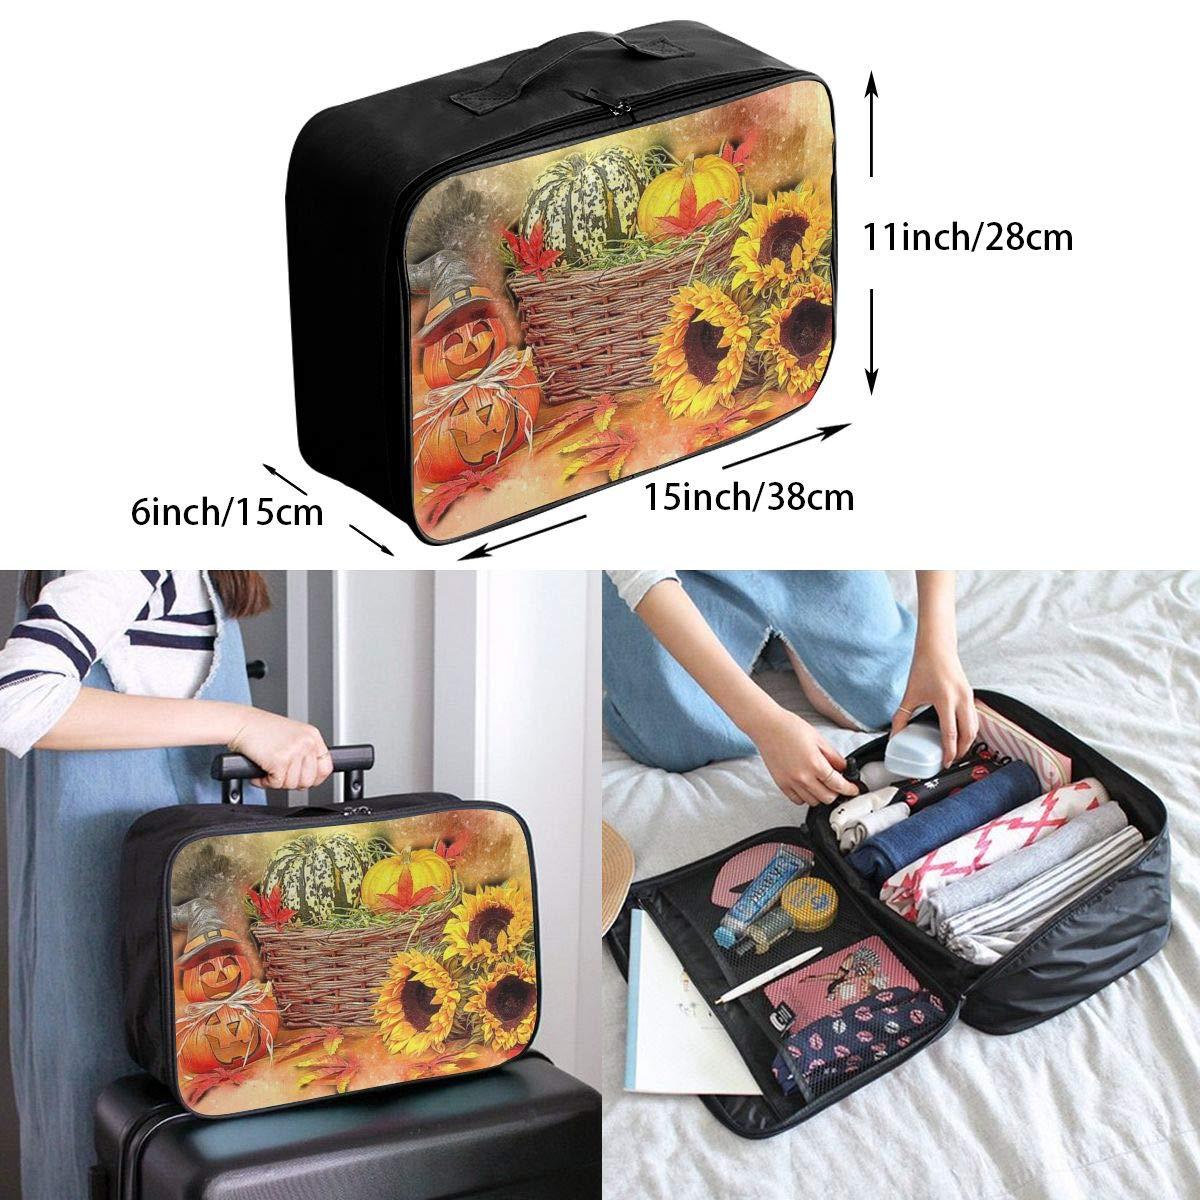 Autumn Halloween Harvest Pumpkin Travel Lightweight Waterproof Foldable Storage Carry Luggage Large Capacity Portable Luggage Bag Duffel Bag